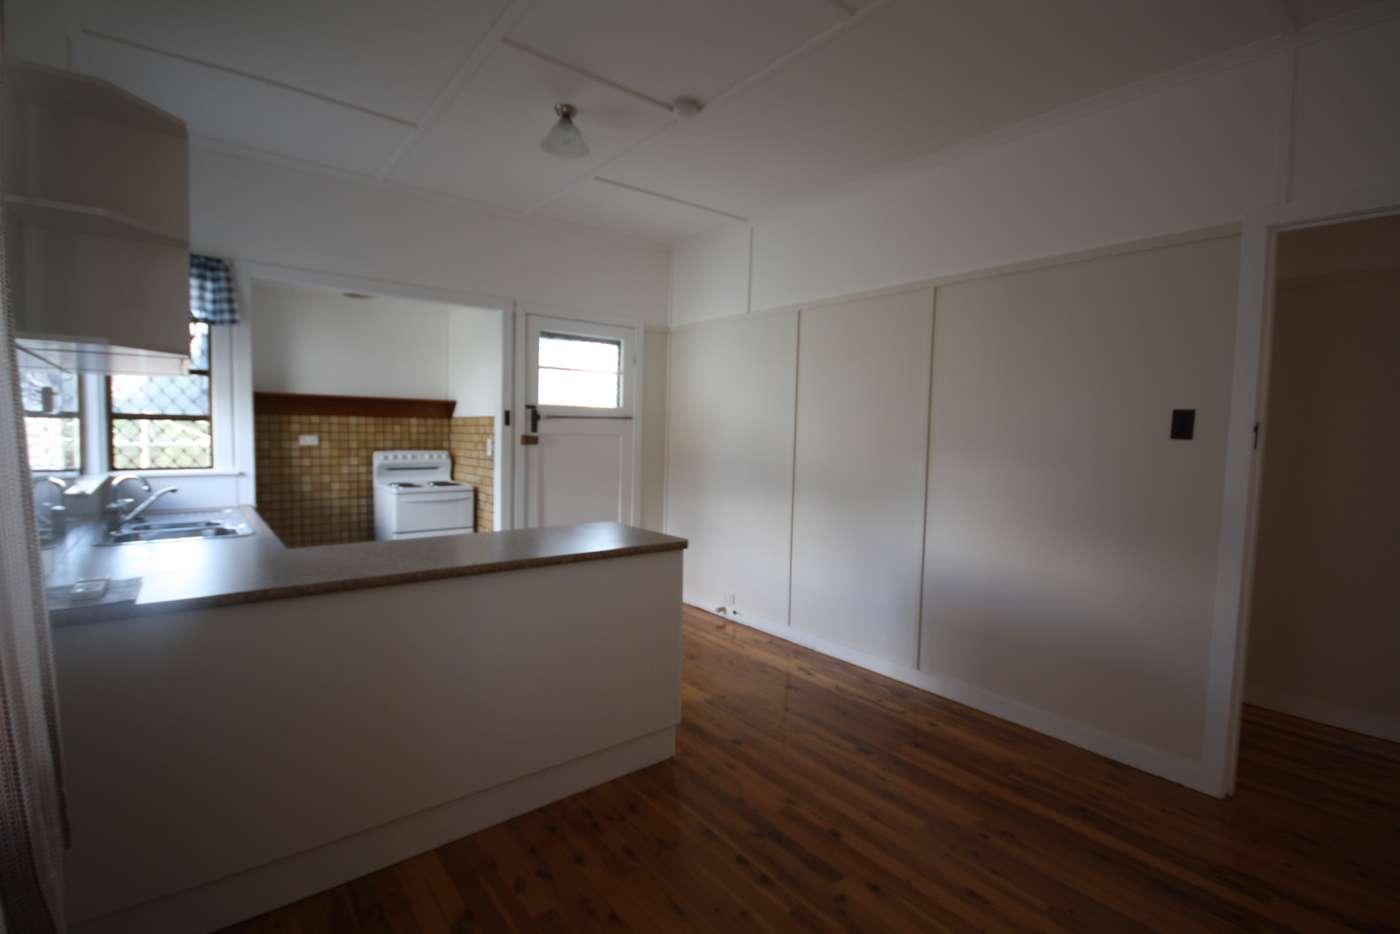 Main view of Homely house listing, 40 Yarrawonga Street, Warwick QLD 4370